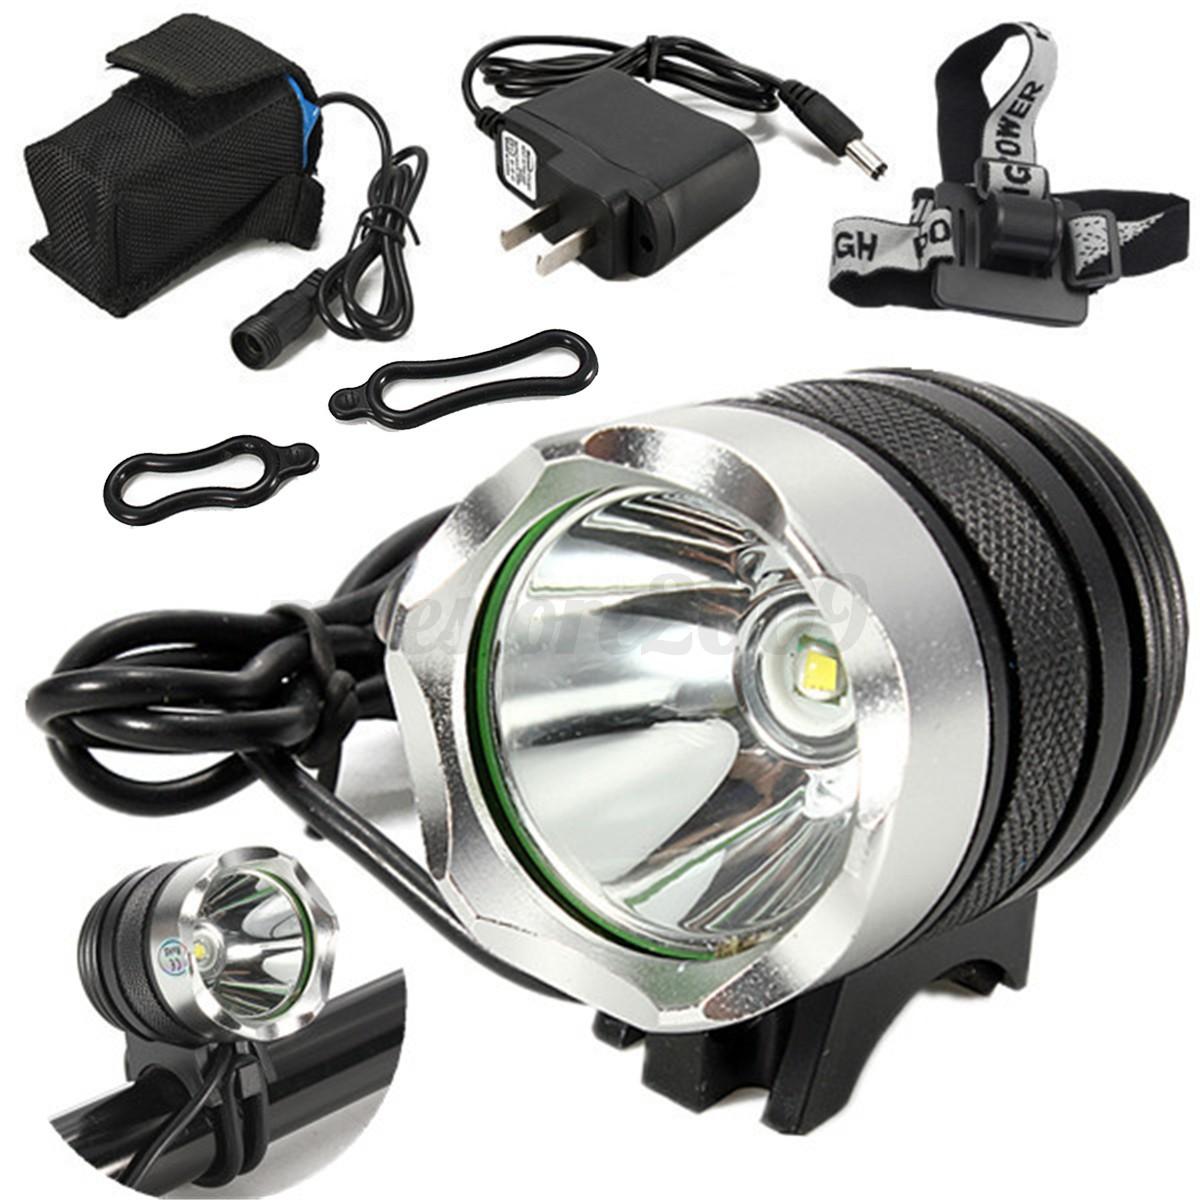 Elfeland 5000LM T6 LED Bicycle Bike Headlight Headlamp ...